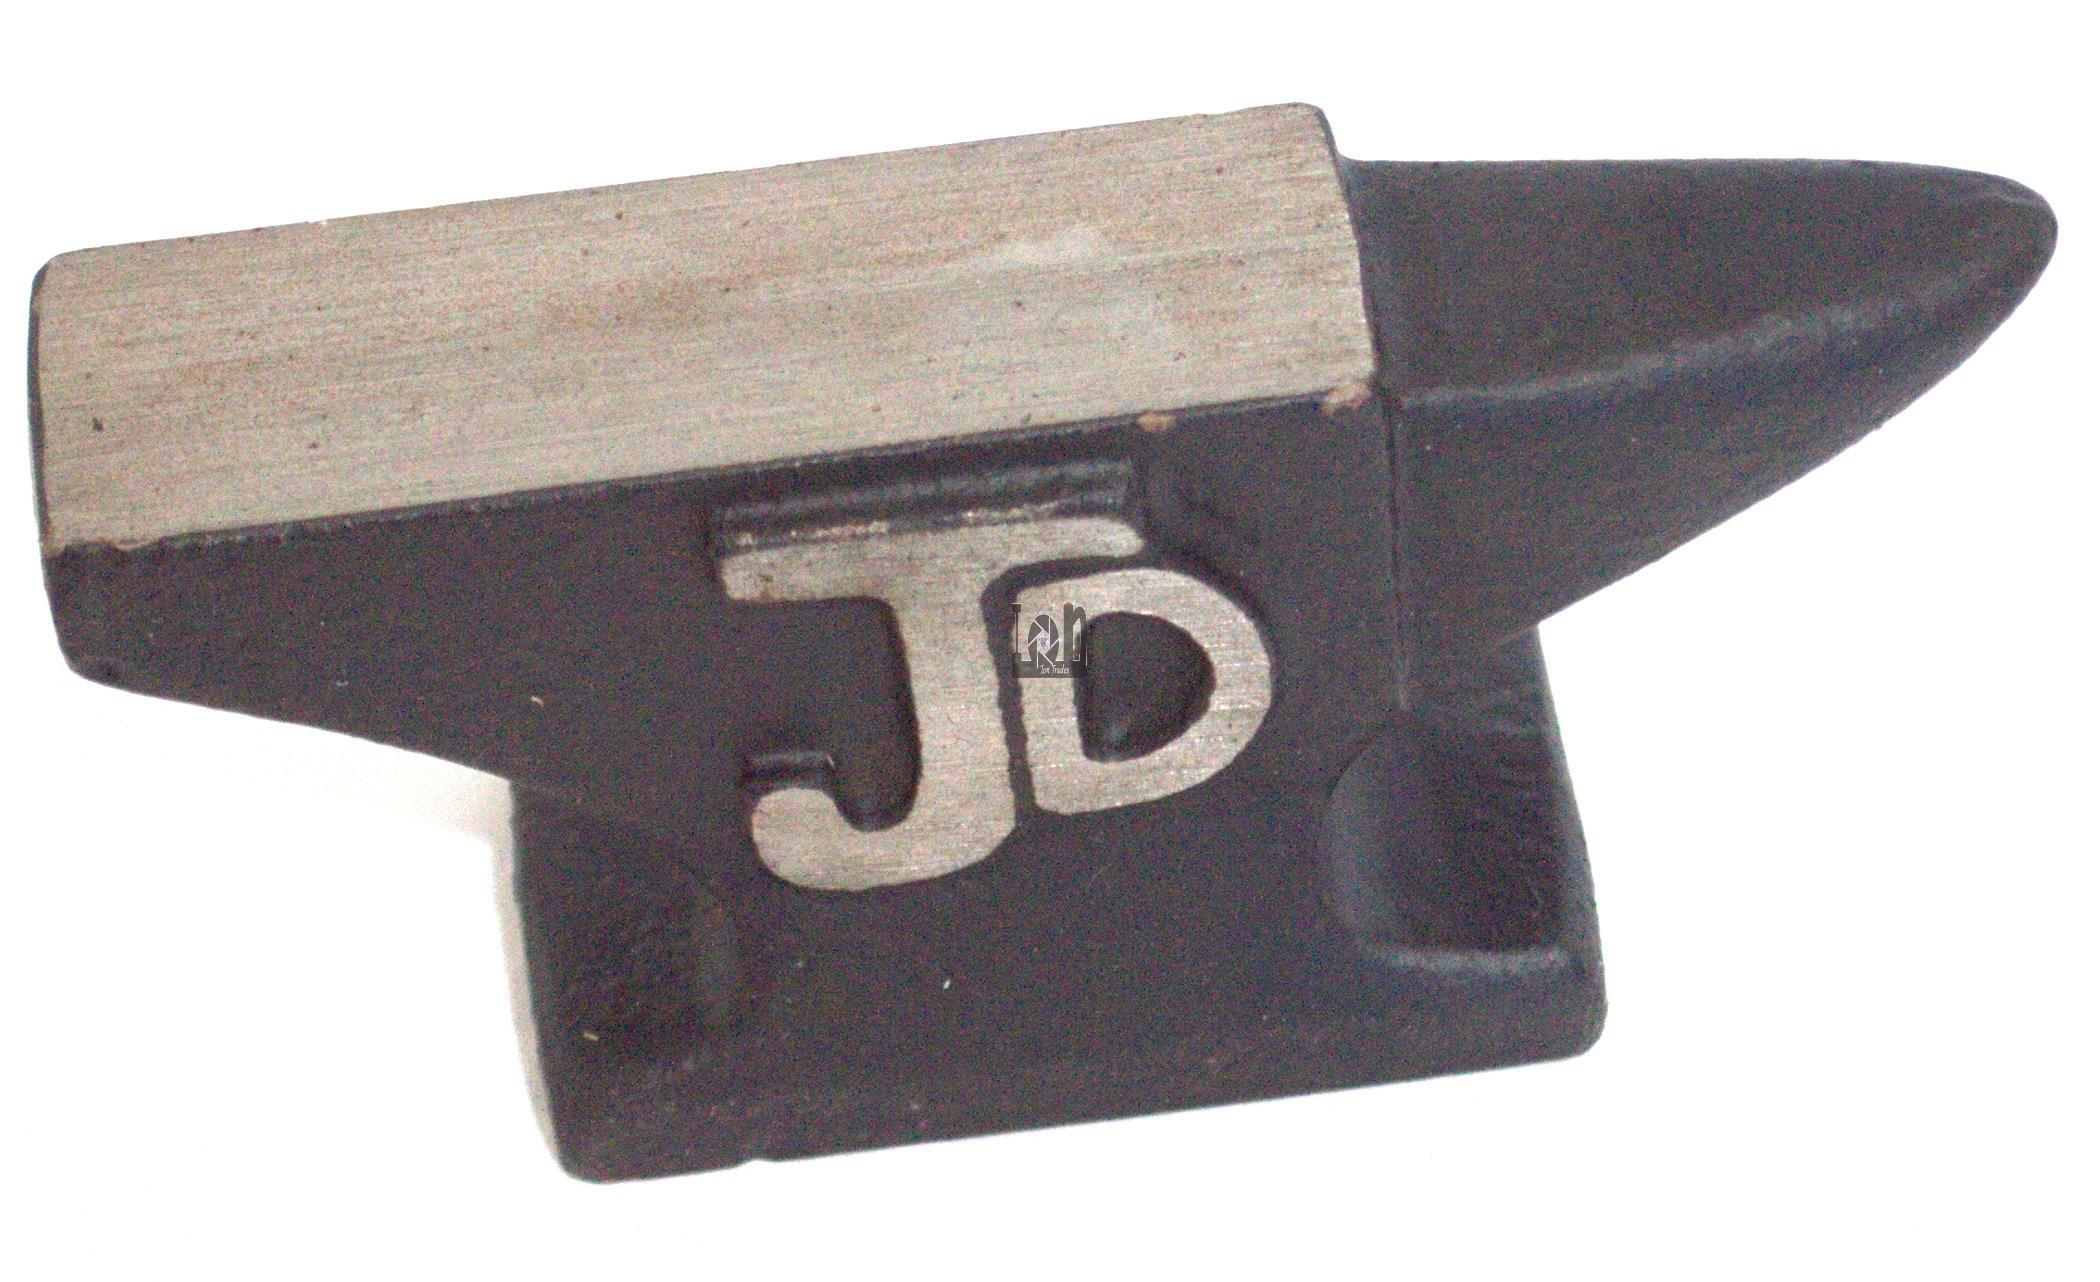 1.75lb Small Anvil Jewelers Tools Blacksmithing Tools